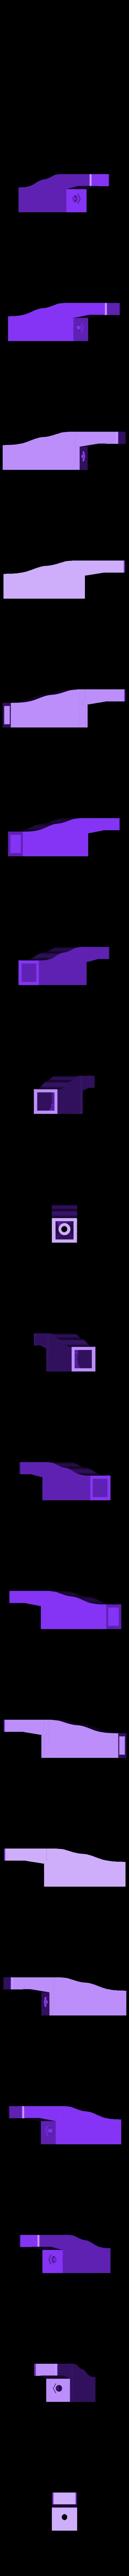 Structure_Sensor_Grip.STL Download free STL file iPhone 5,6 Structure Sensor Grip • 3D printable model, Istareyn